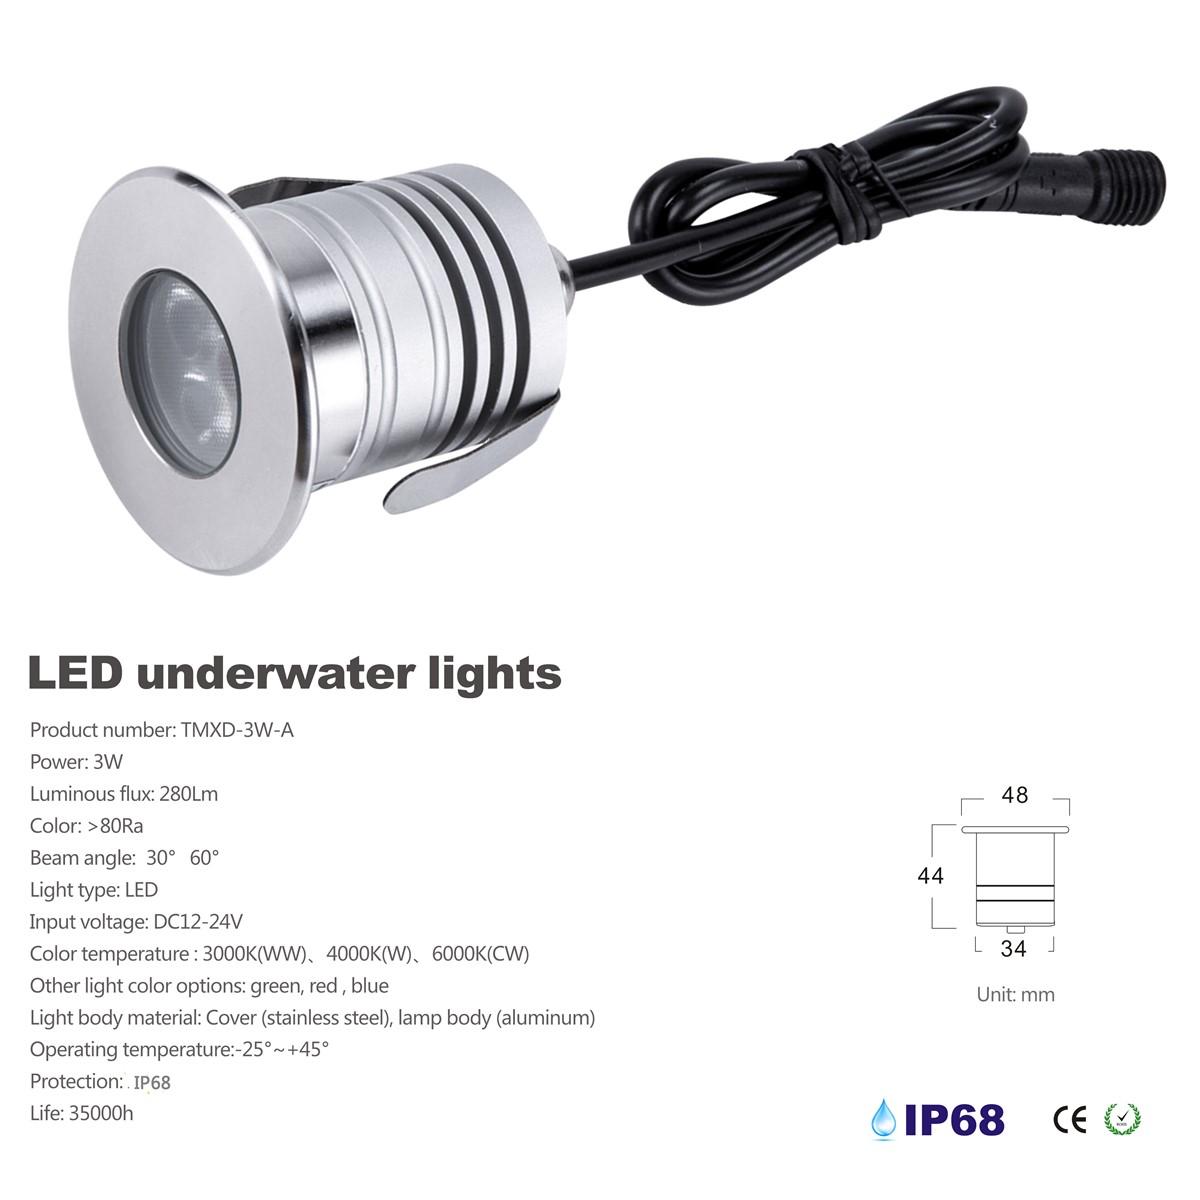 Mini 3W Cree XBD LED Underwater Light DC1224V IP68 Waterproof spotlight